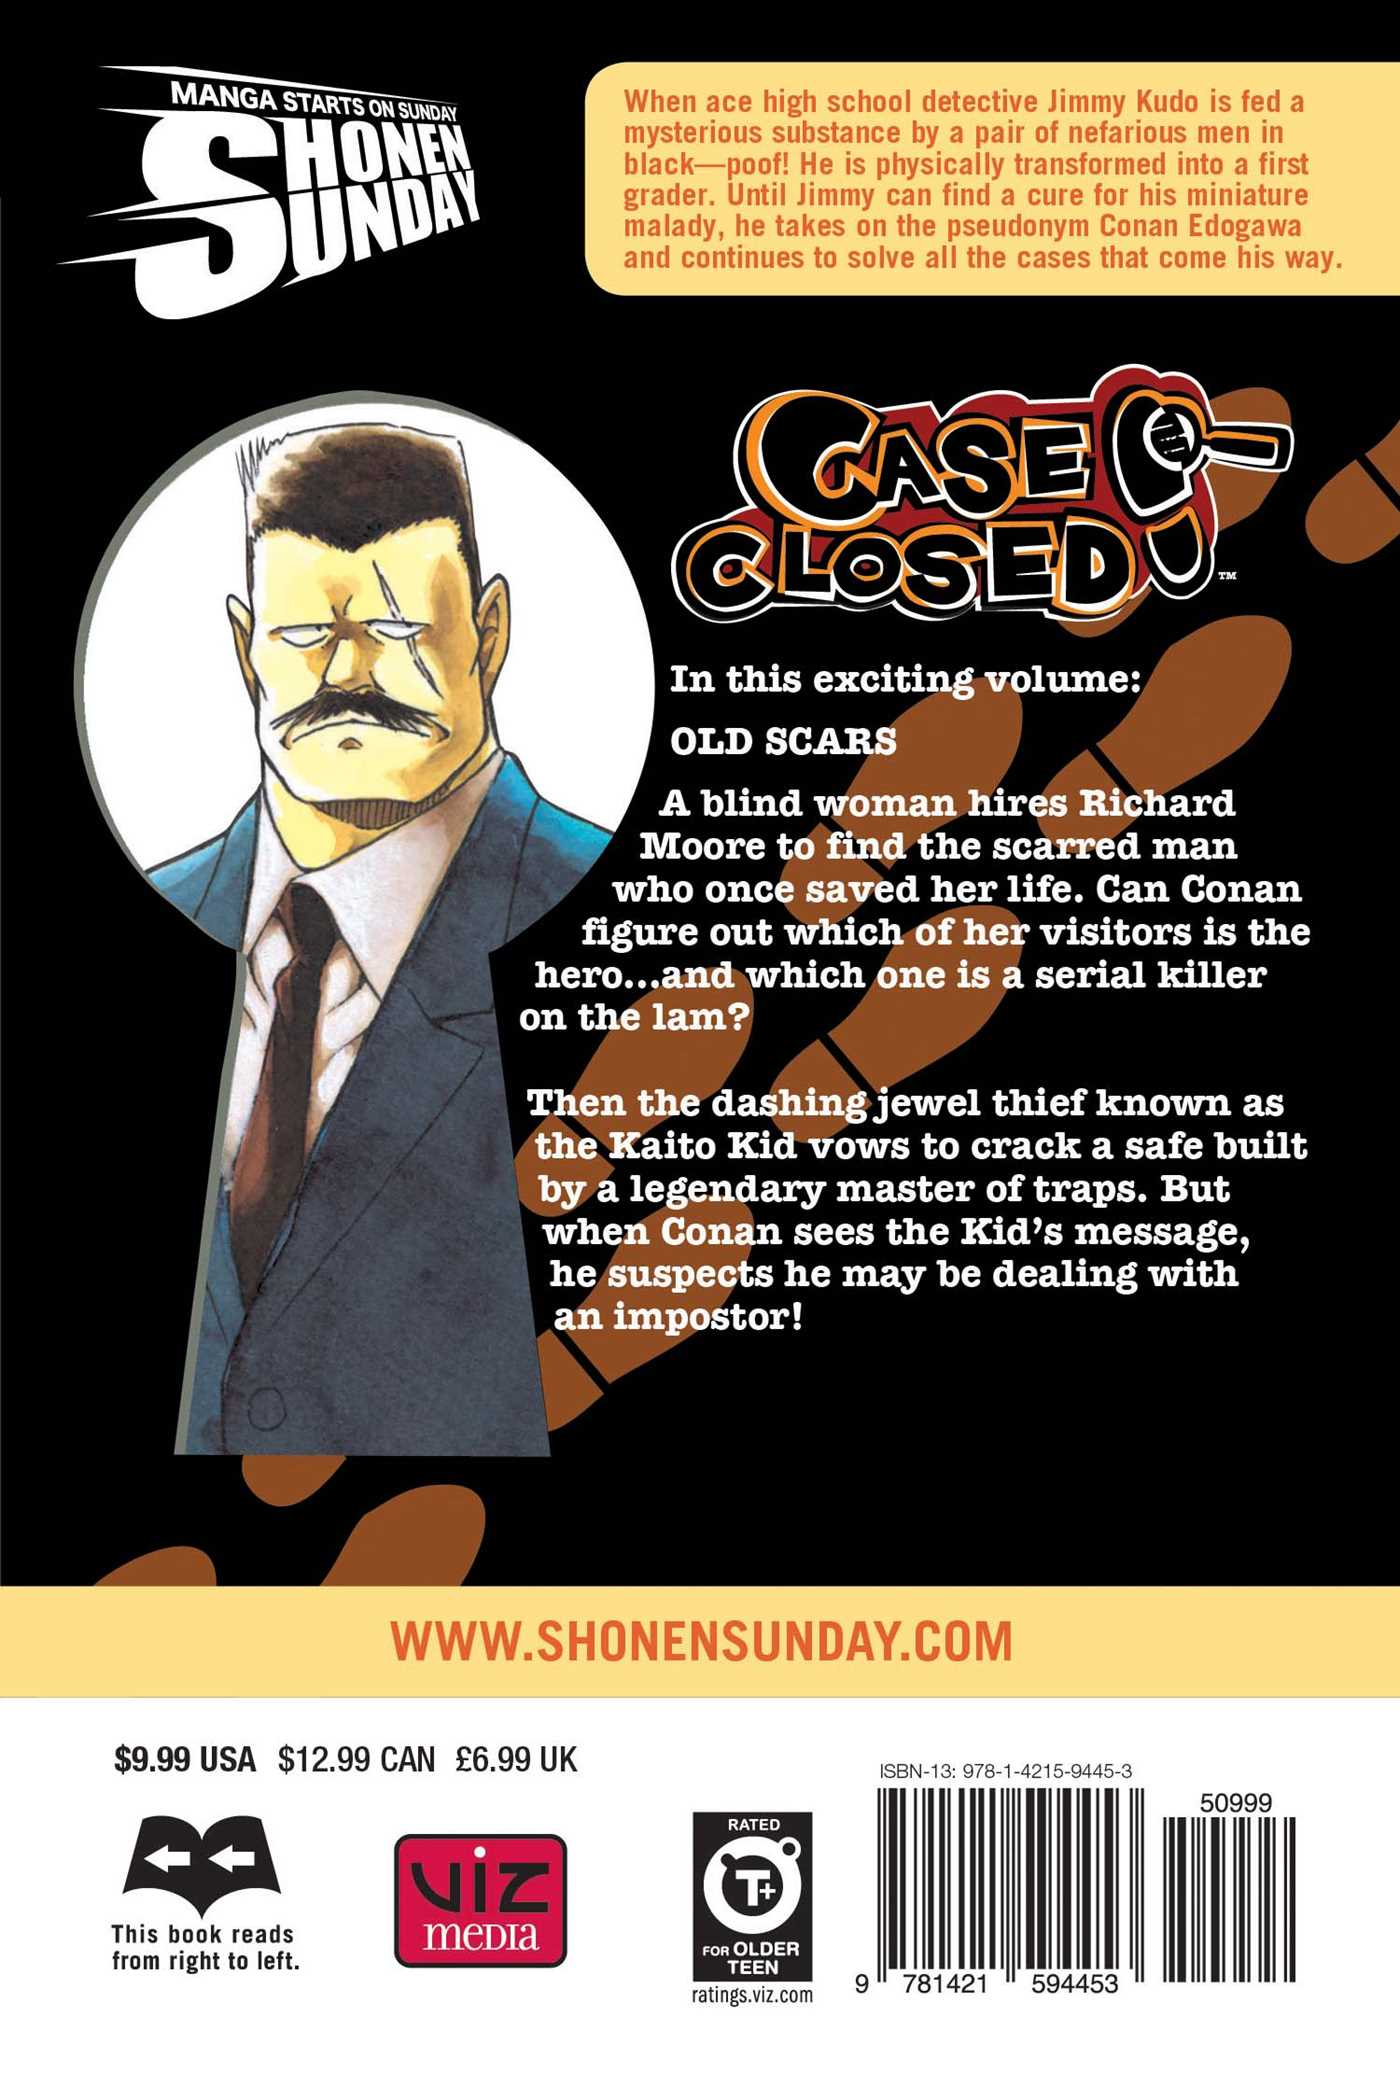 Case closed vol 64 9781421594453 hr back